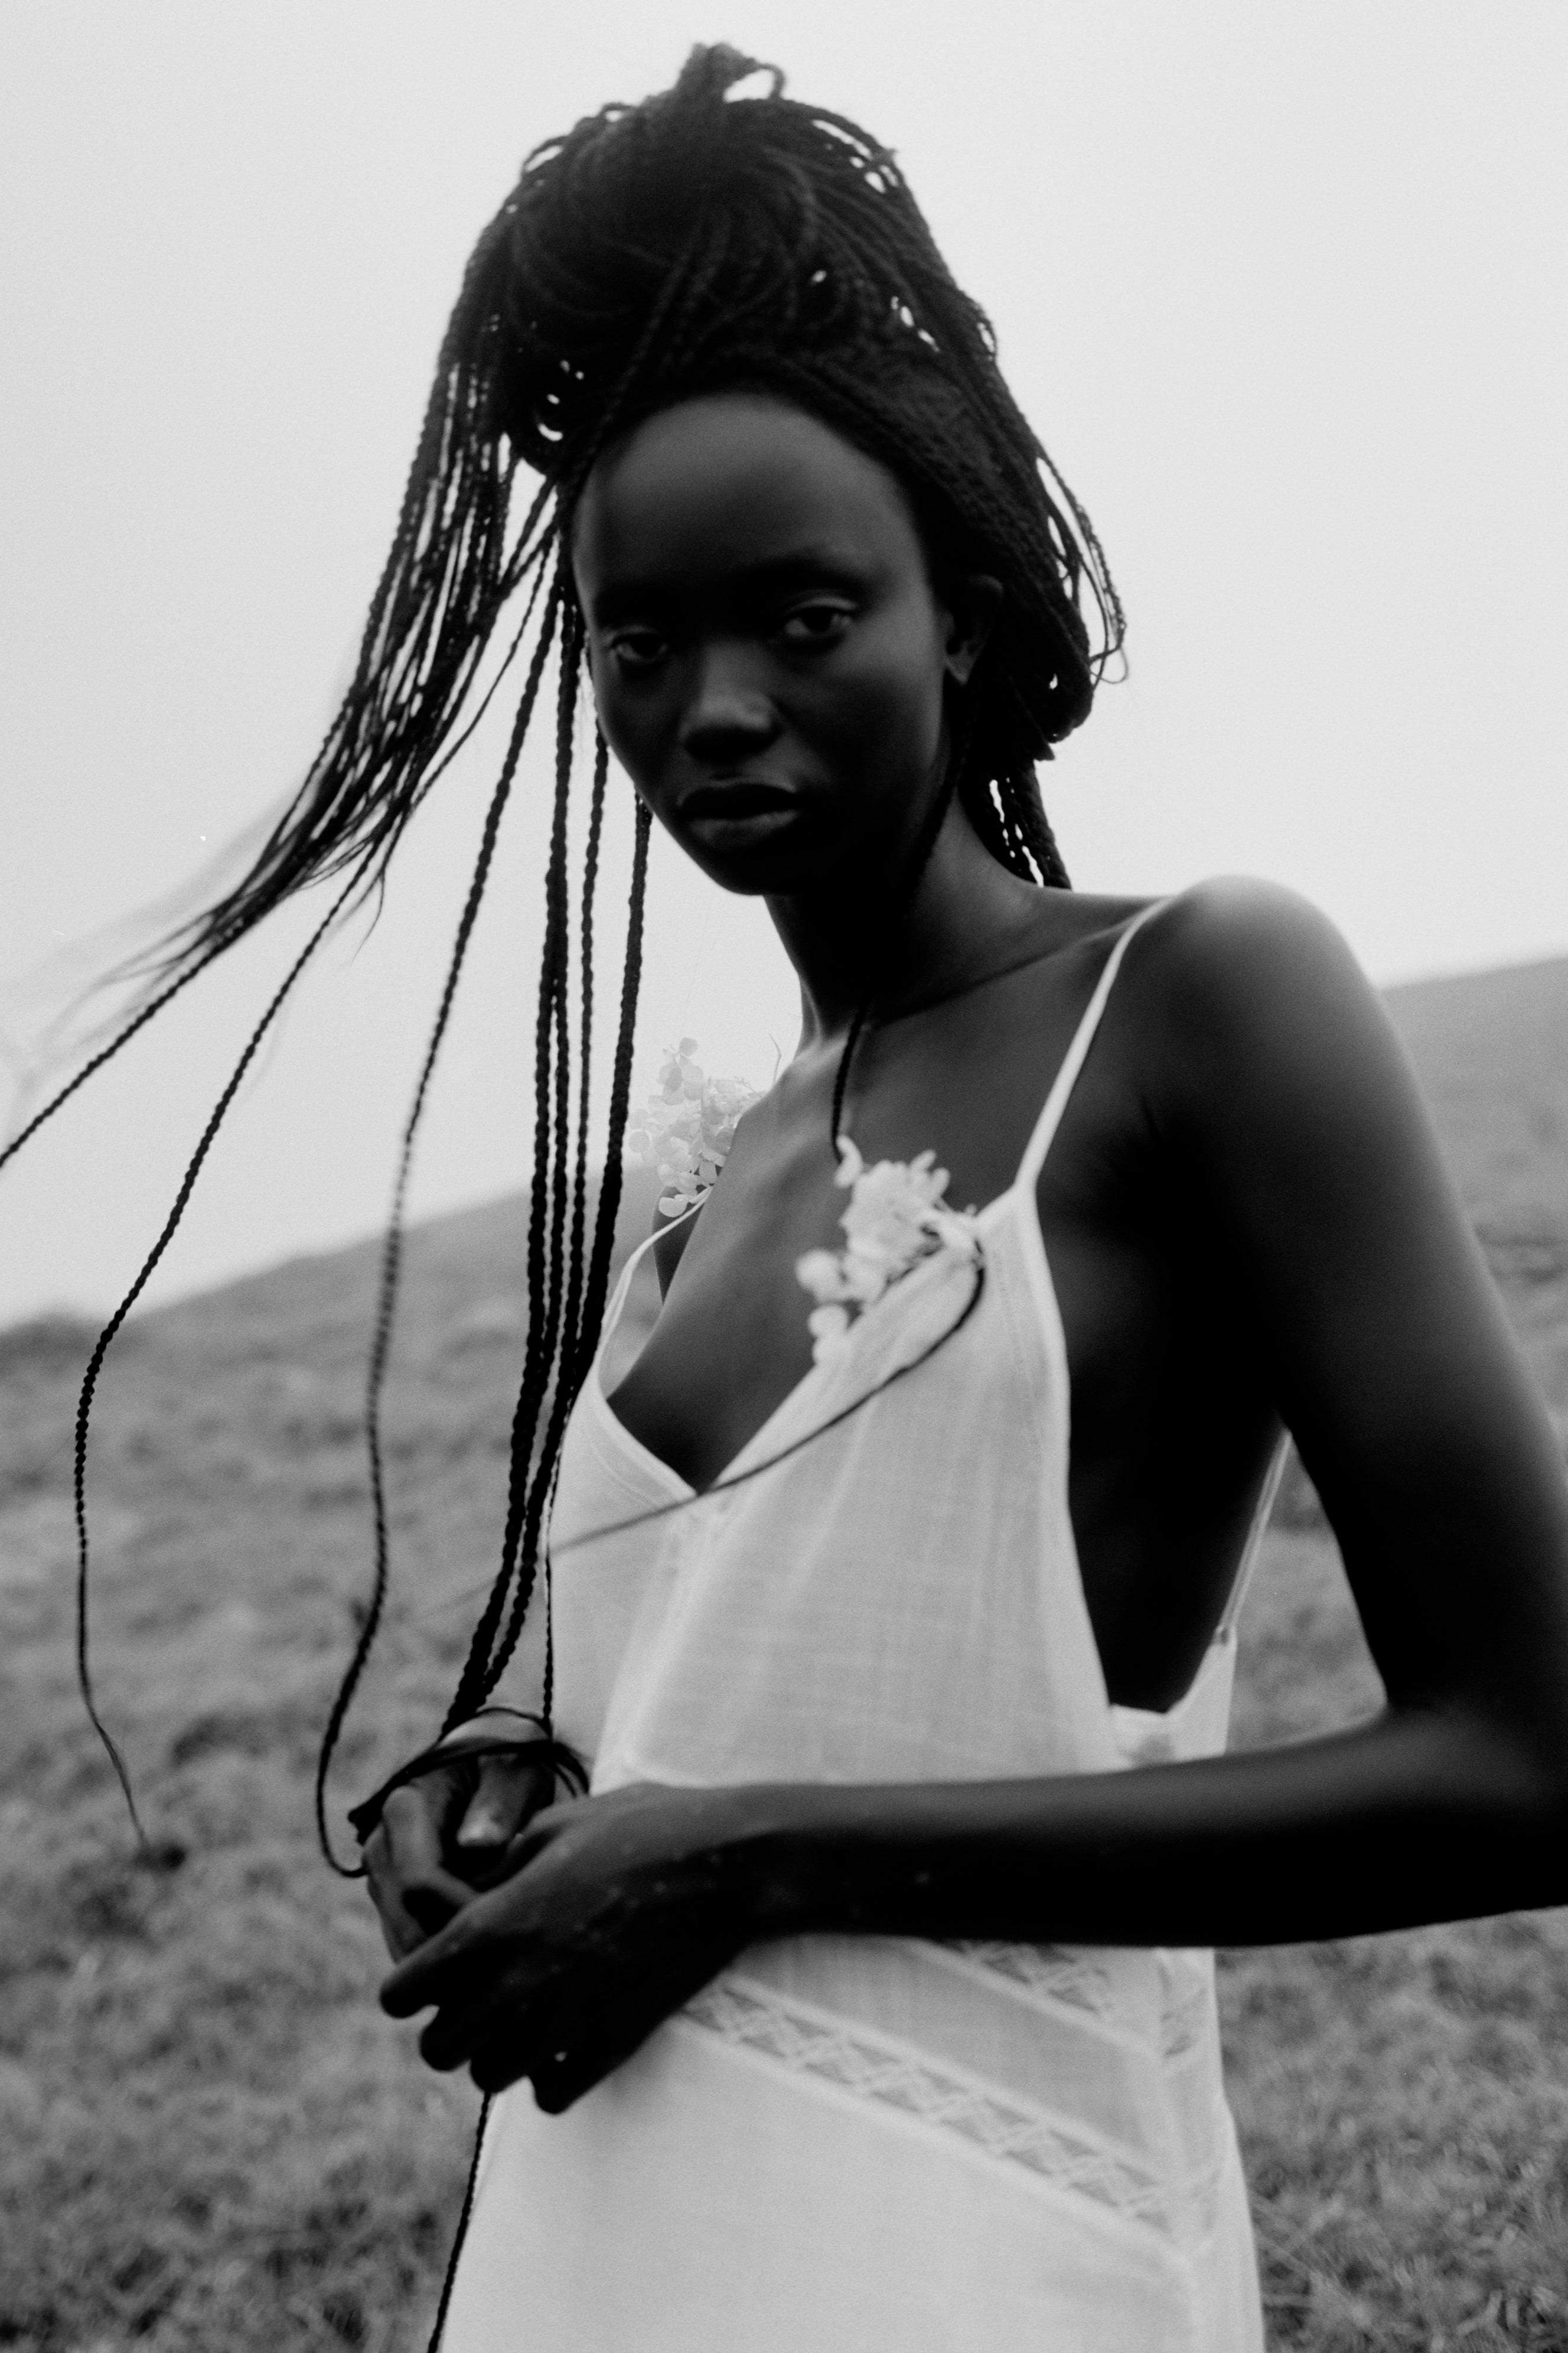 Agi Akur for SIR the Label by Jake Terrey | Pride Models news